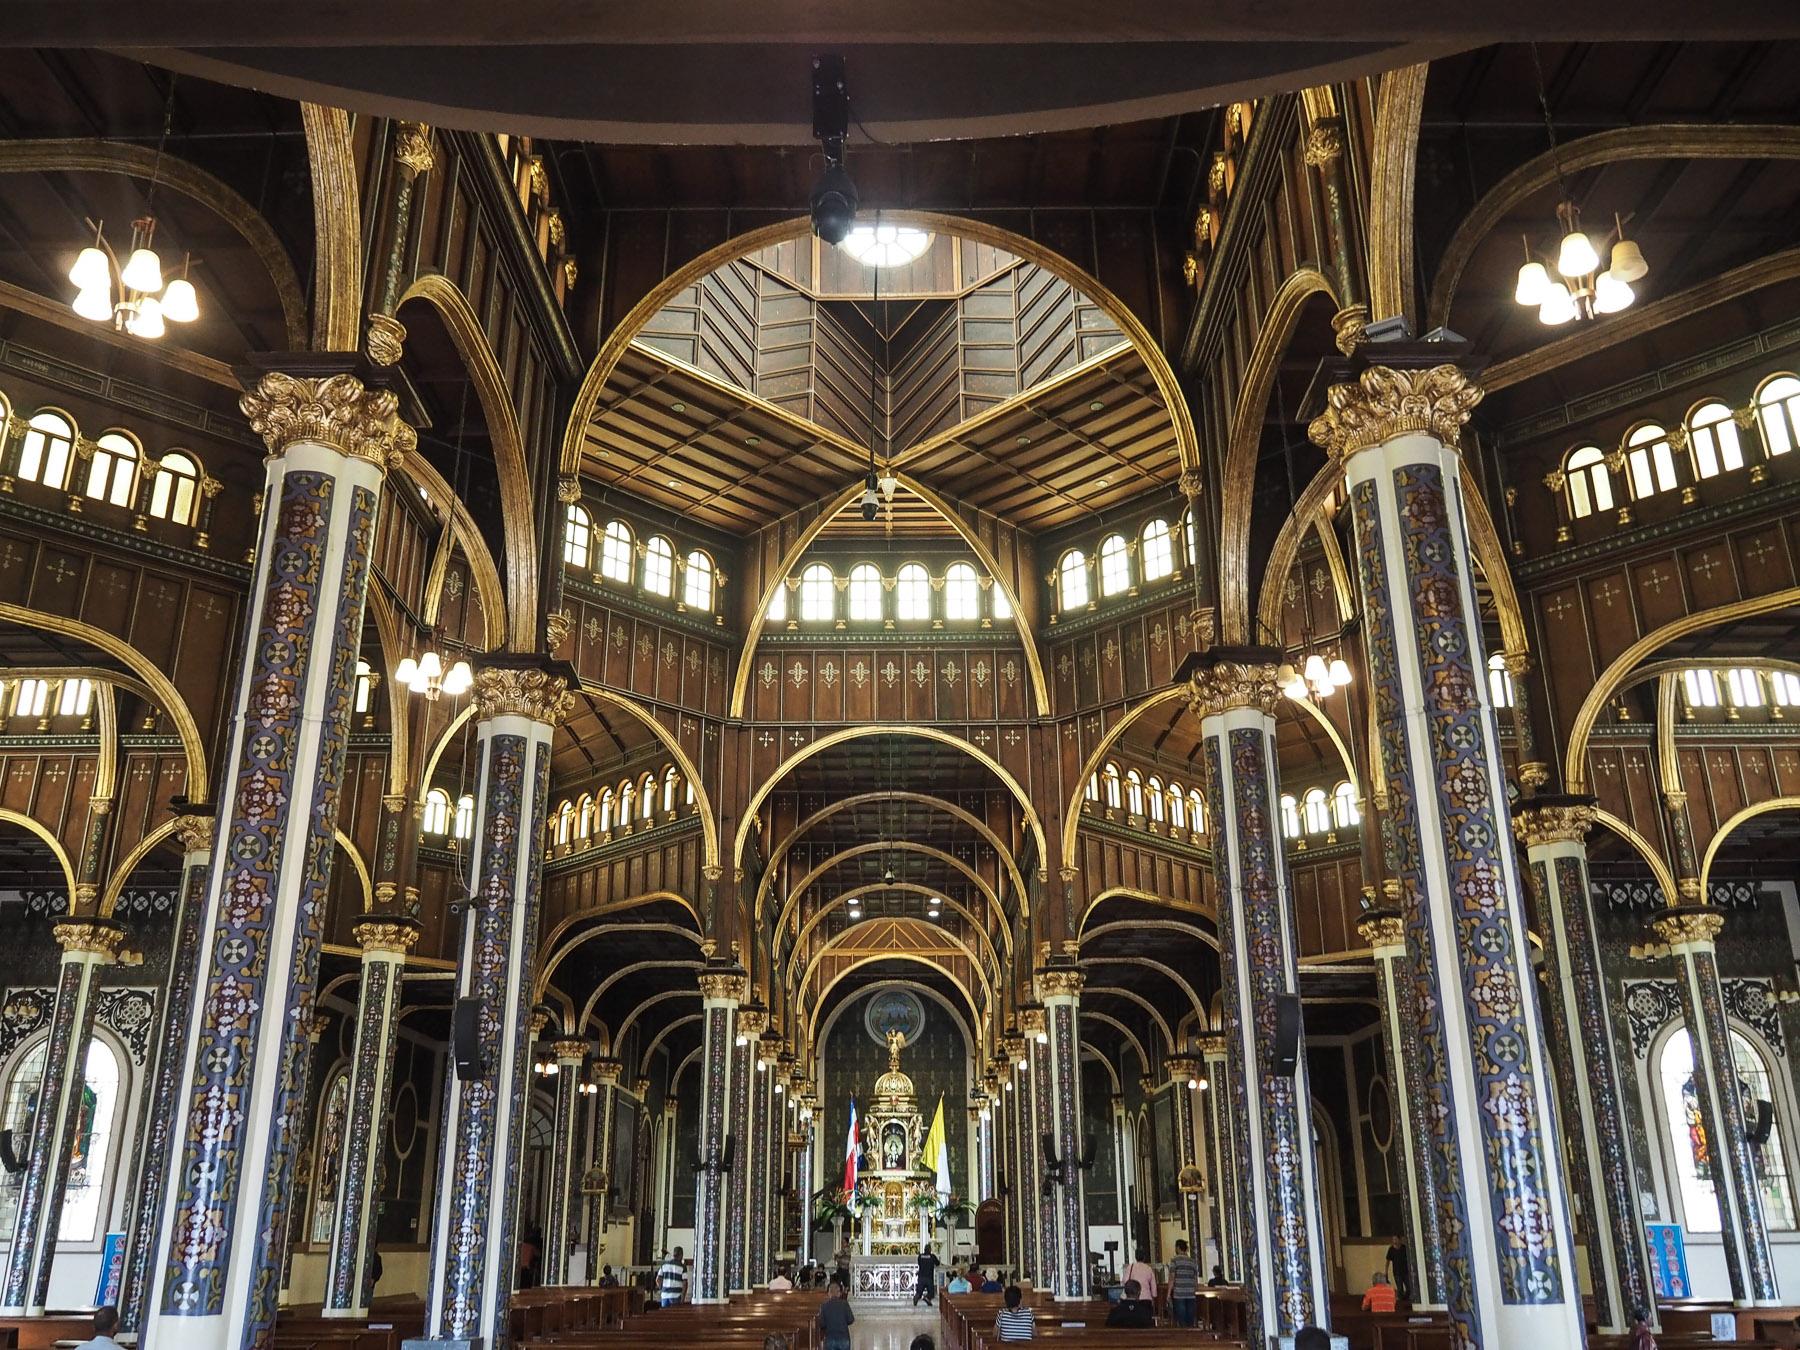 Wallfahrtskirche Basilika Nuestra Senora de los Angeles in Granada